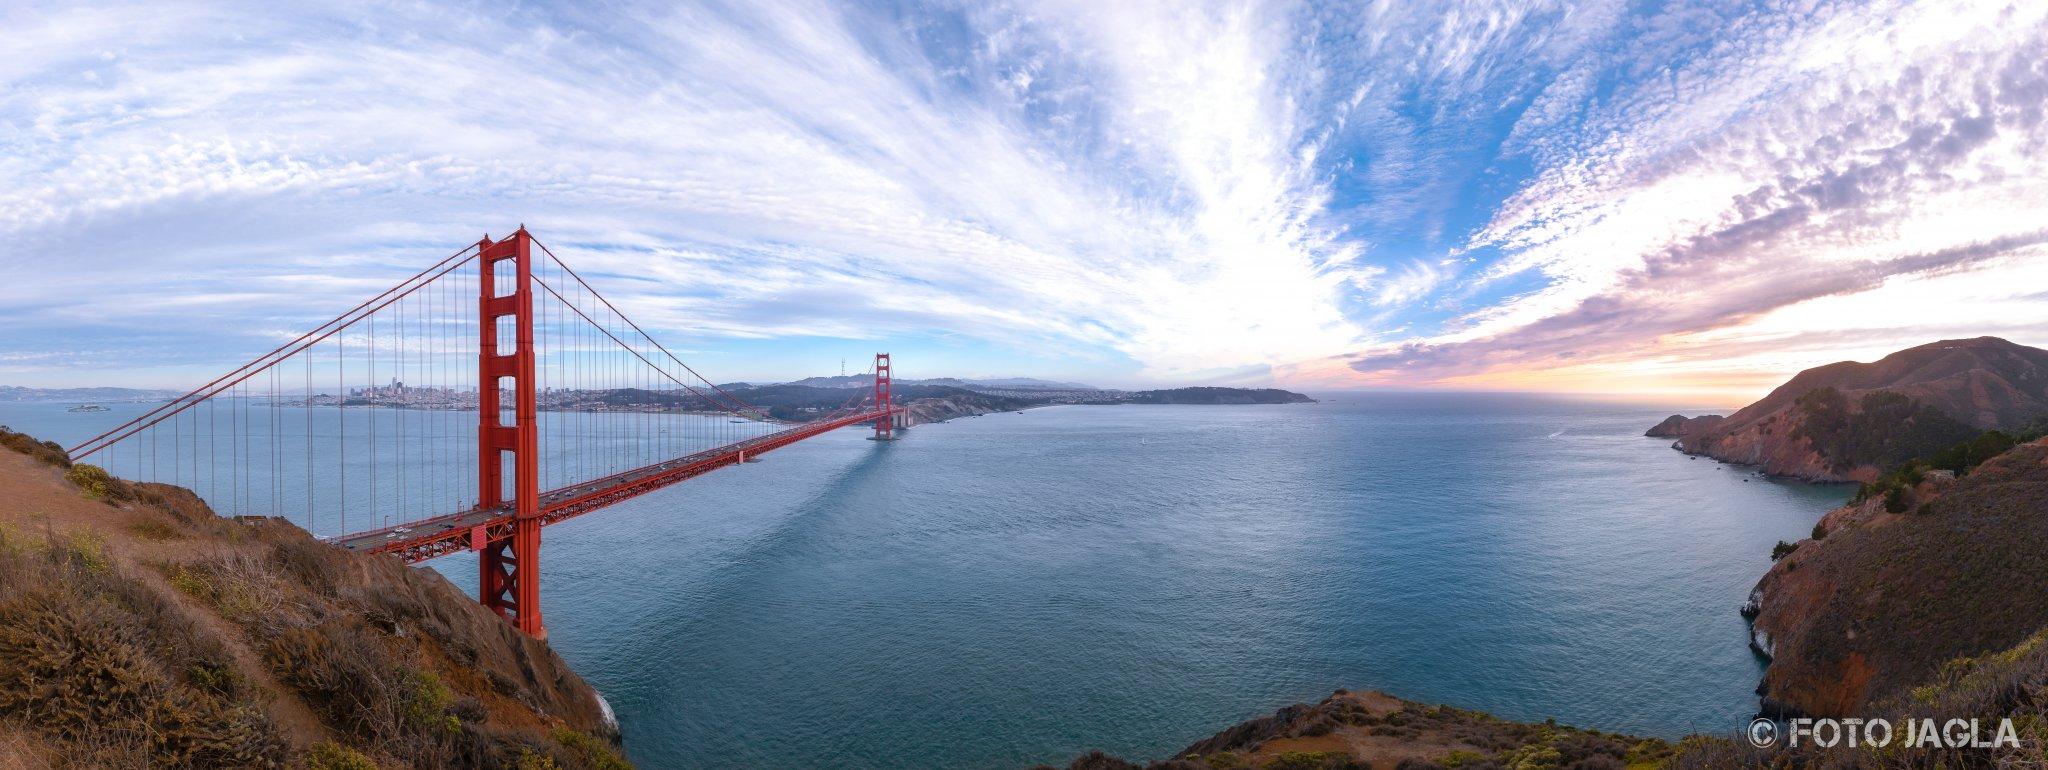 Kalifornien - September 2018 Sonnenuntergang an der Golden Gate Bridge San Francisco - Battery Spencer